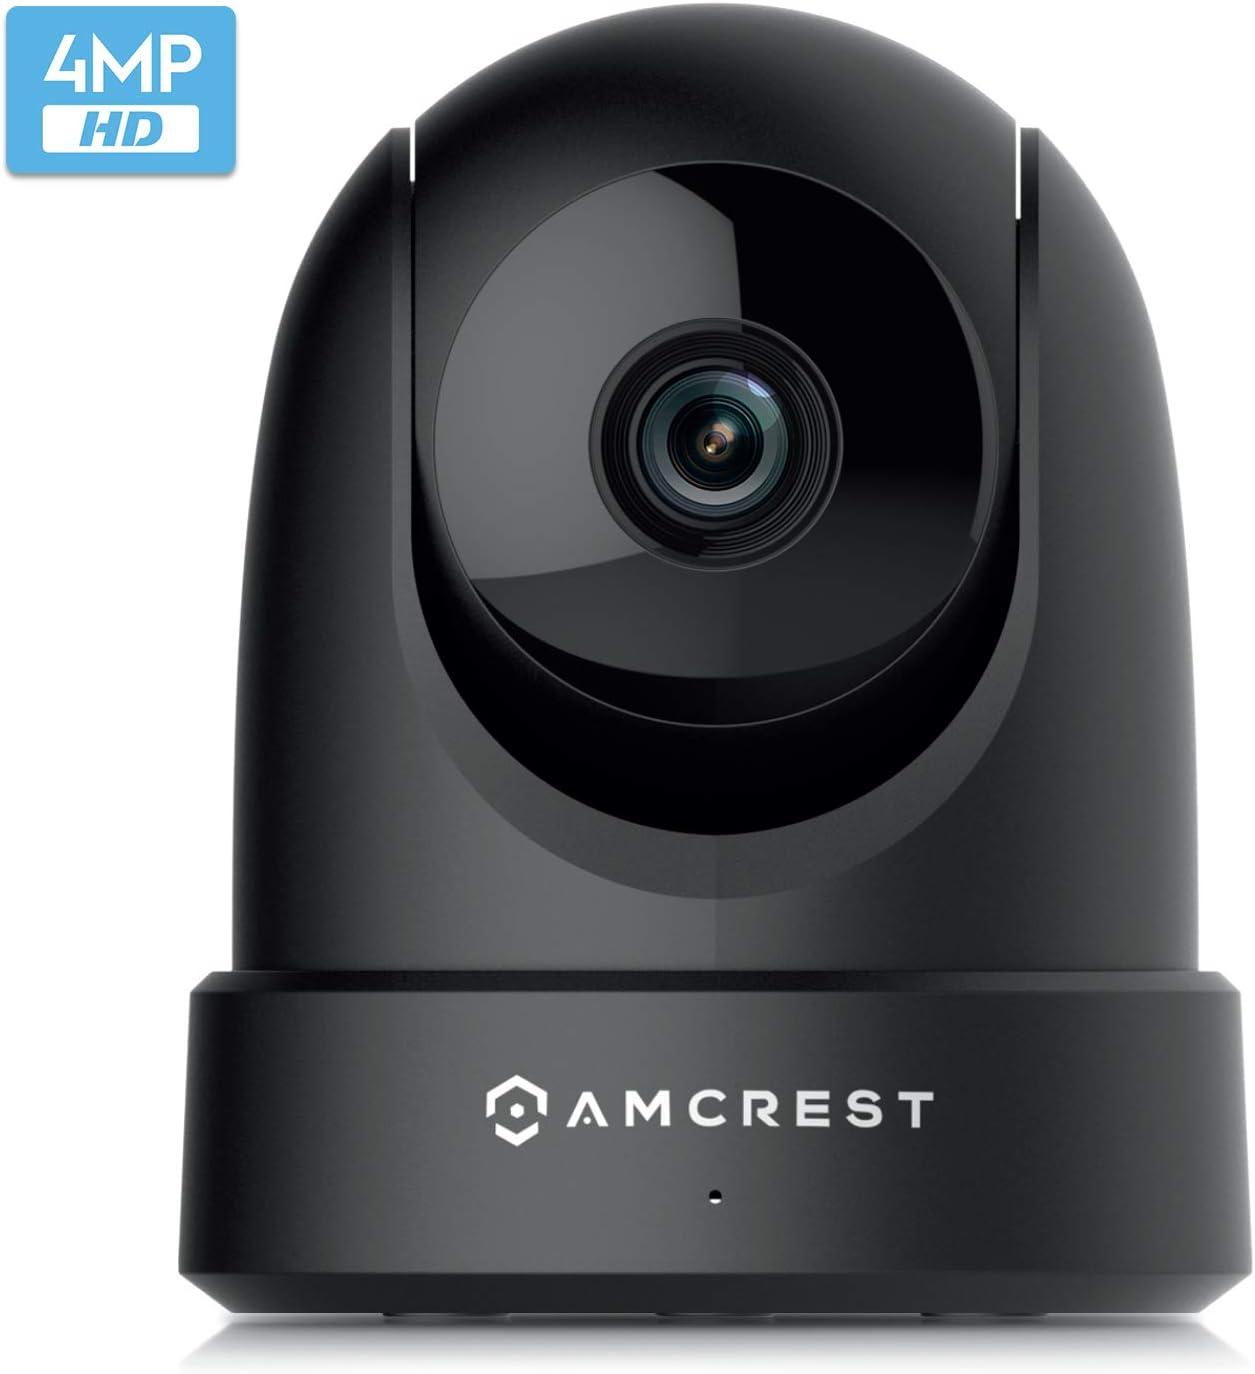 Amcrest 4MP UltraHD Indoor WiFi Camera, Security IP Camera